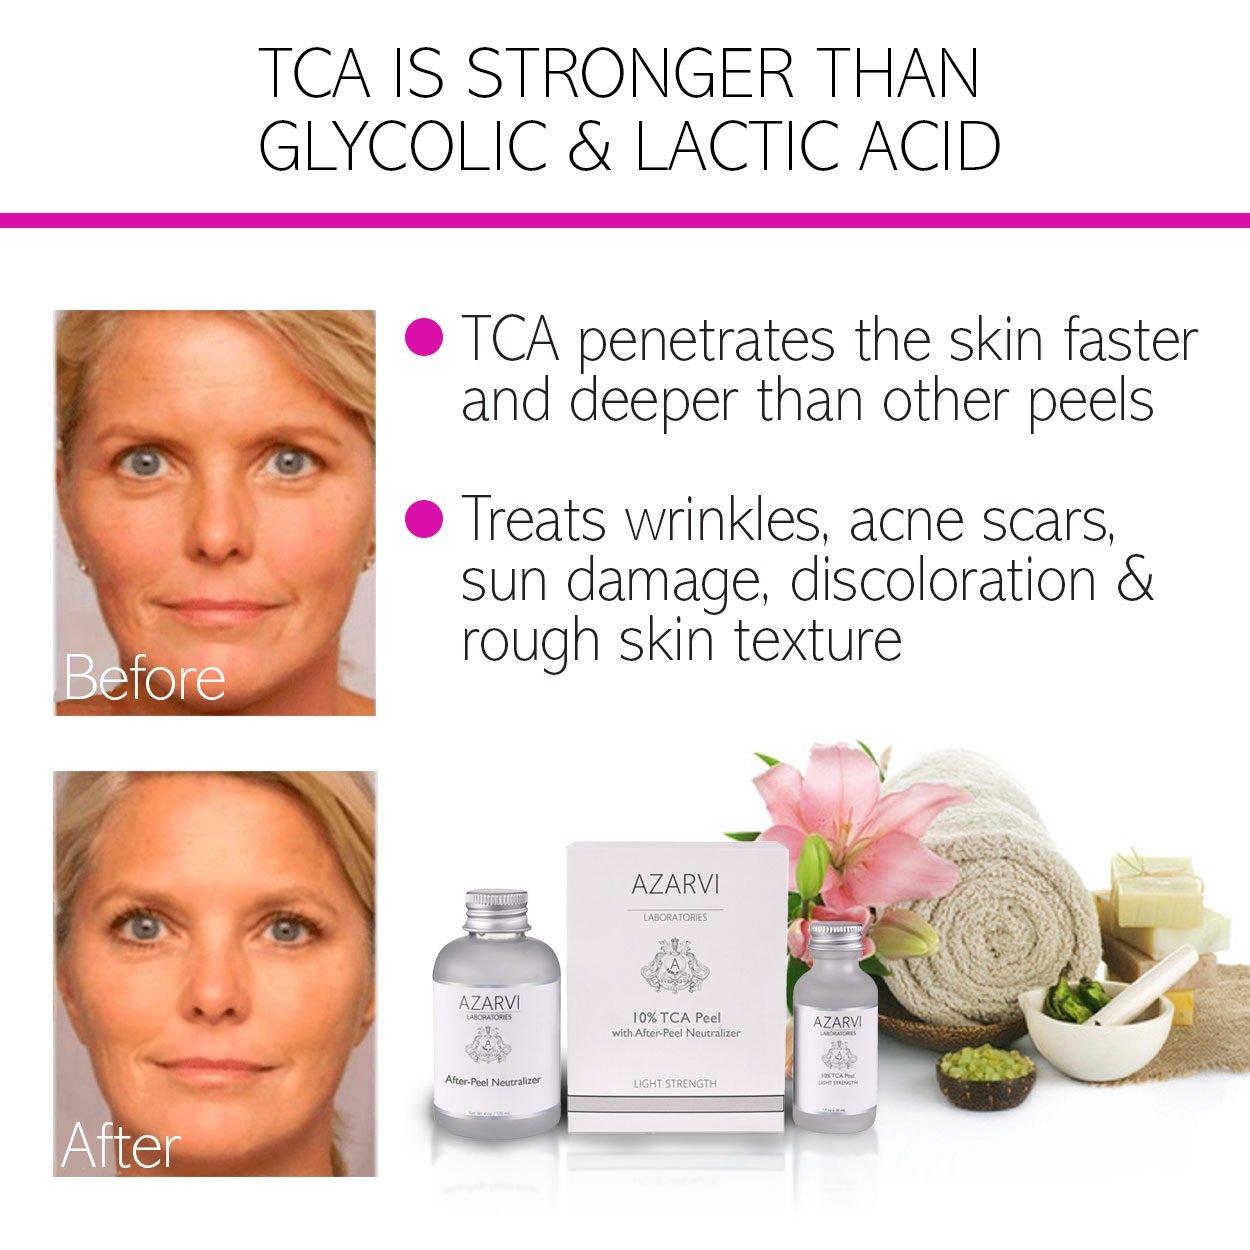 Amazon.com: 10% TCA Peel Including After Peel Neutralizer. Best for  Wrinkles, Acne, Smoker's Skin. Mild-Medium Strength. Contains Retinol &  Vitamin C: ...